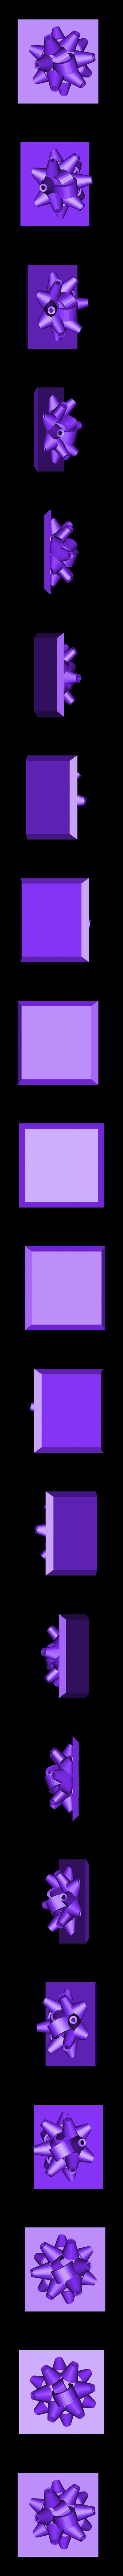 GiftBox_medium_top_bow3.STL Download free STL file Gift Box - Medium • 3D printer model, DDDeco